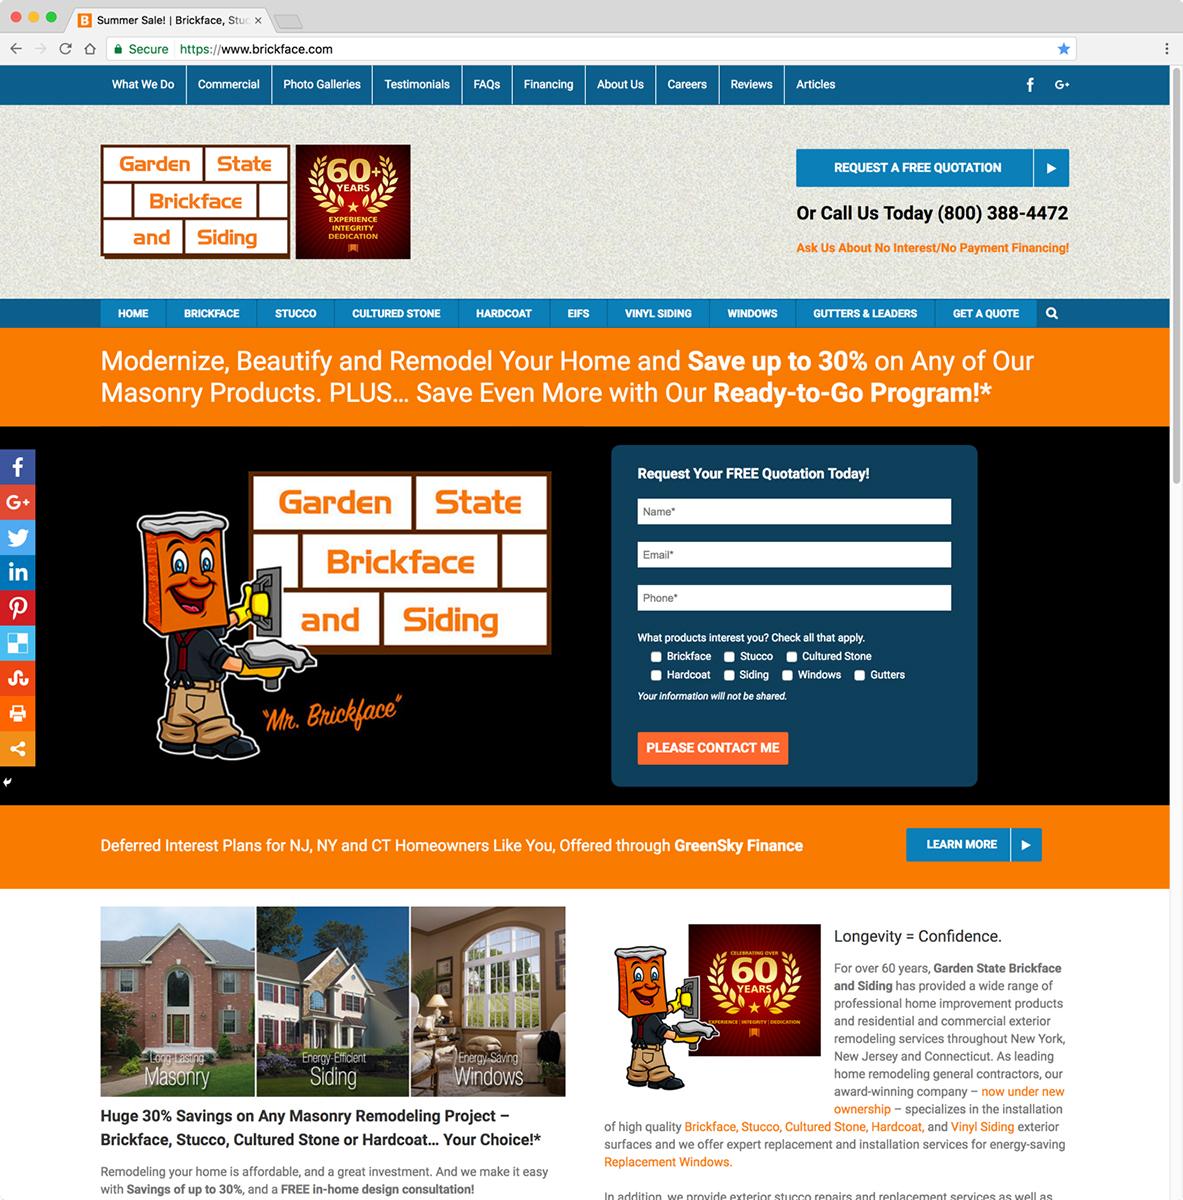 Garden State Brickface and Siding Website